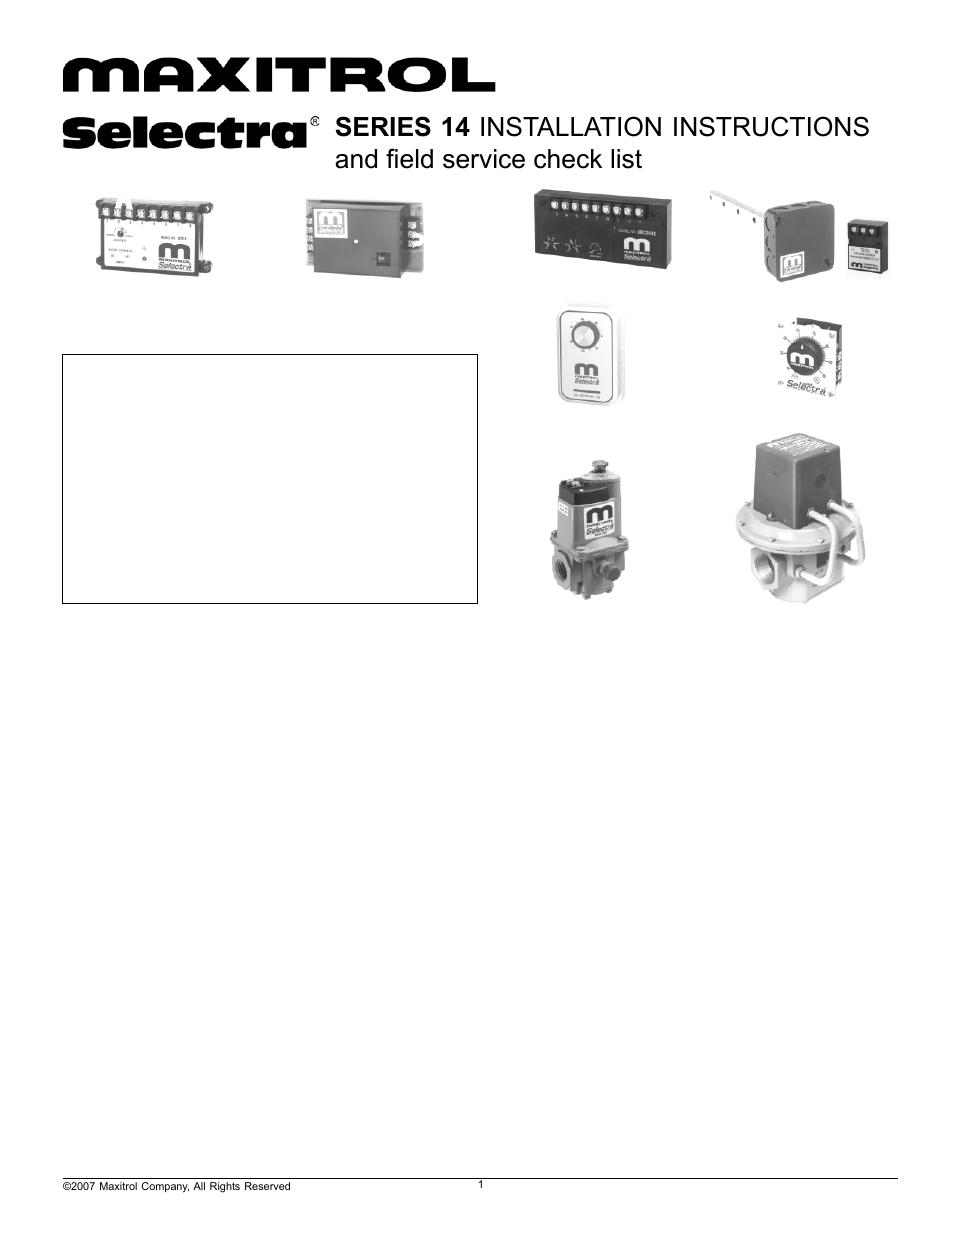 Greenheck Maxitrol Series 14 User Manual